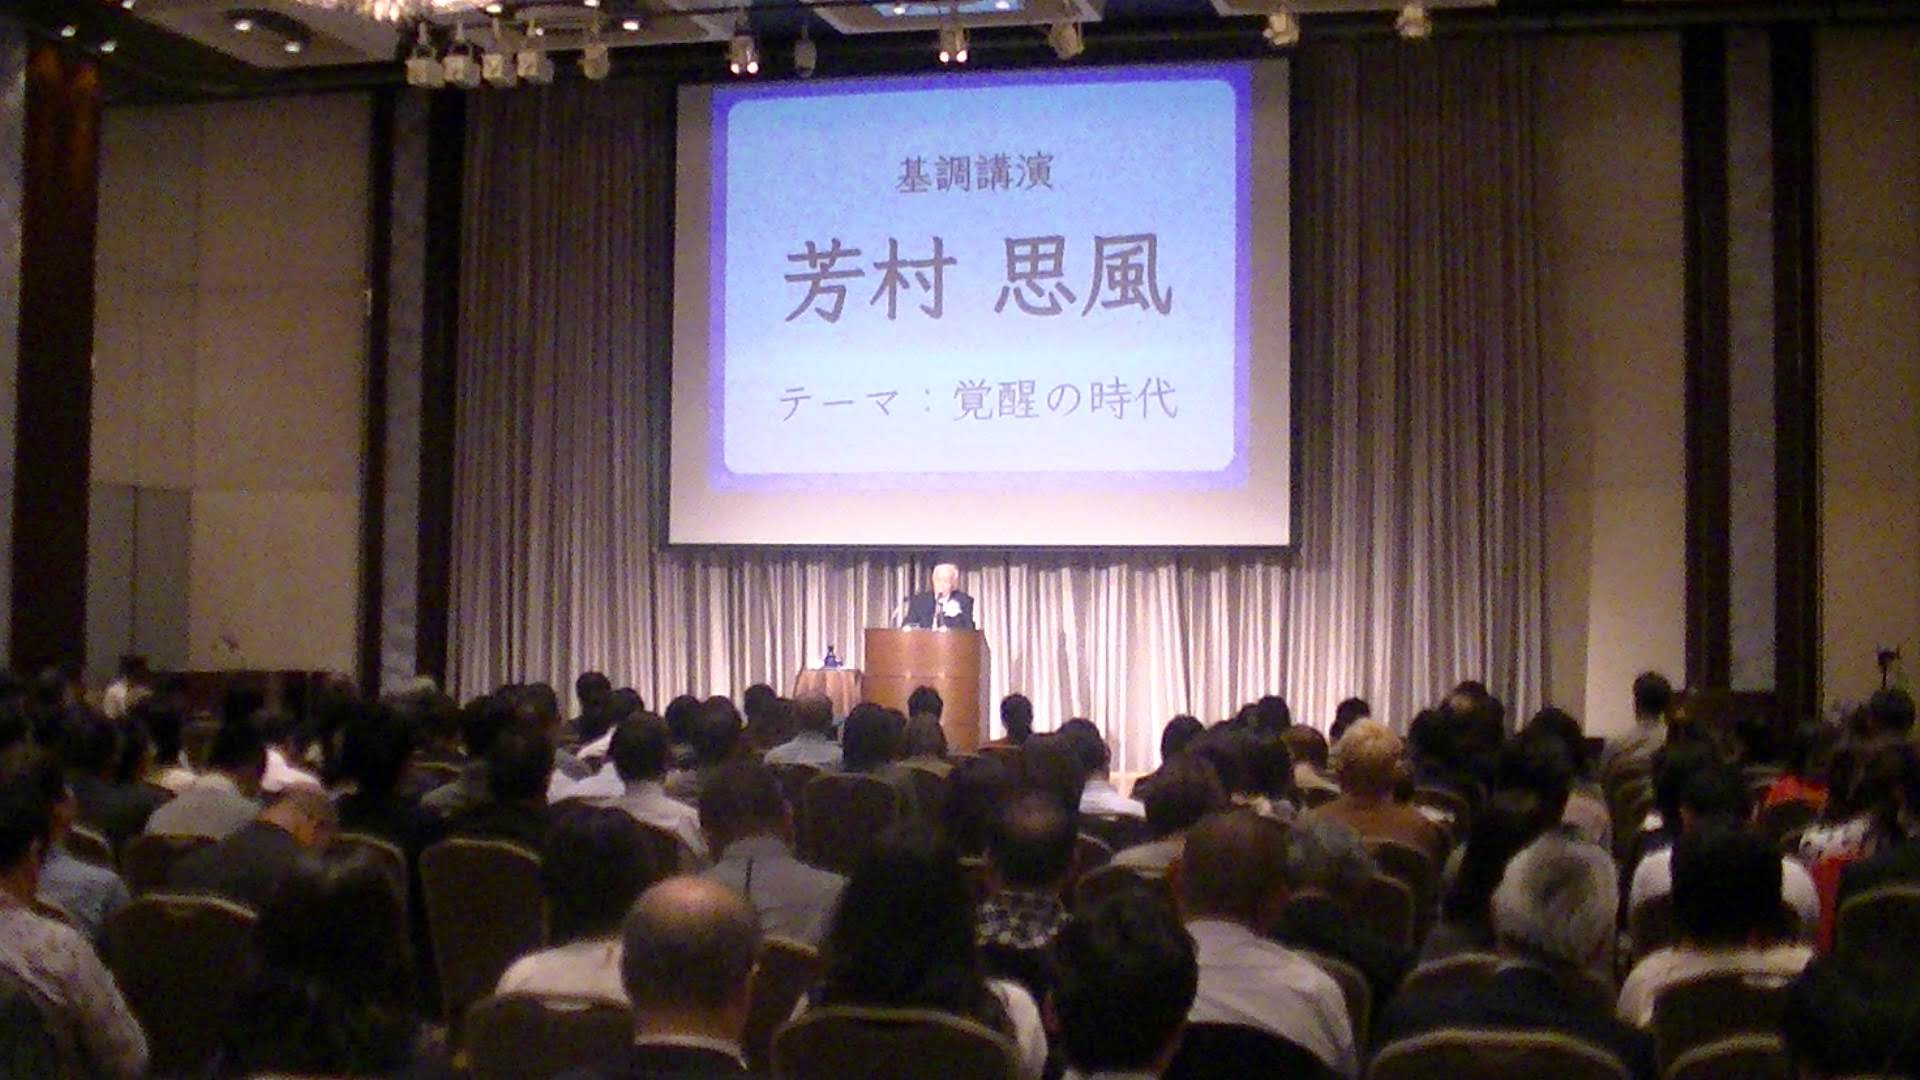 PIC 1734 1 - 思風会全国大会in広島